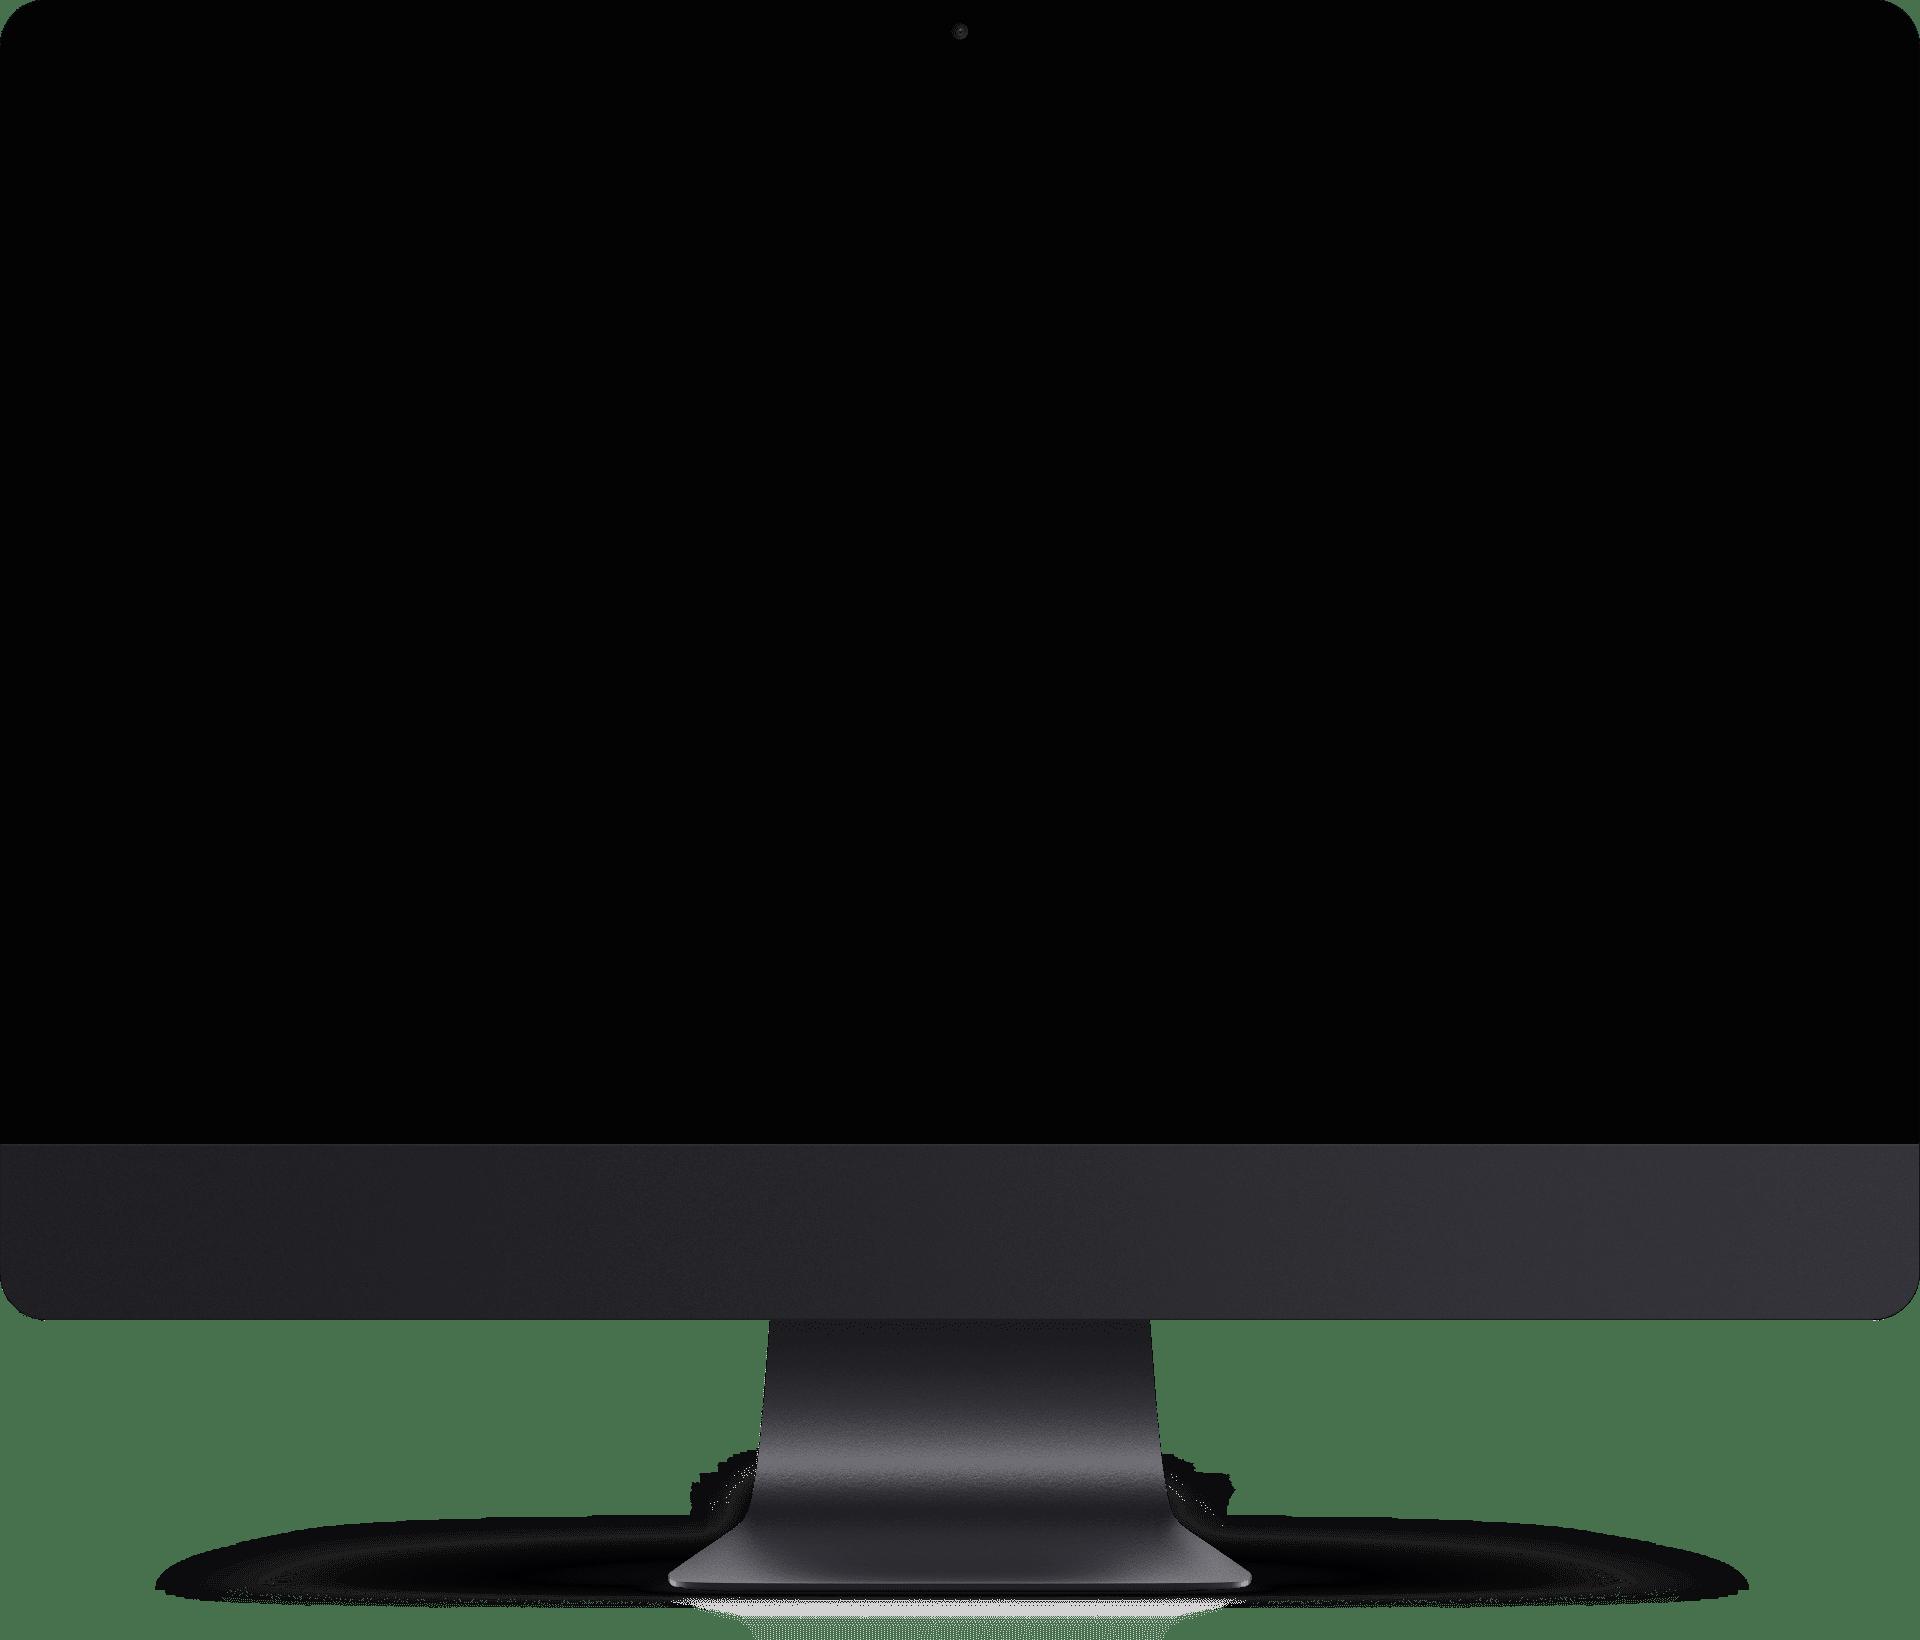 Imac screen